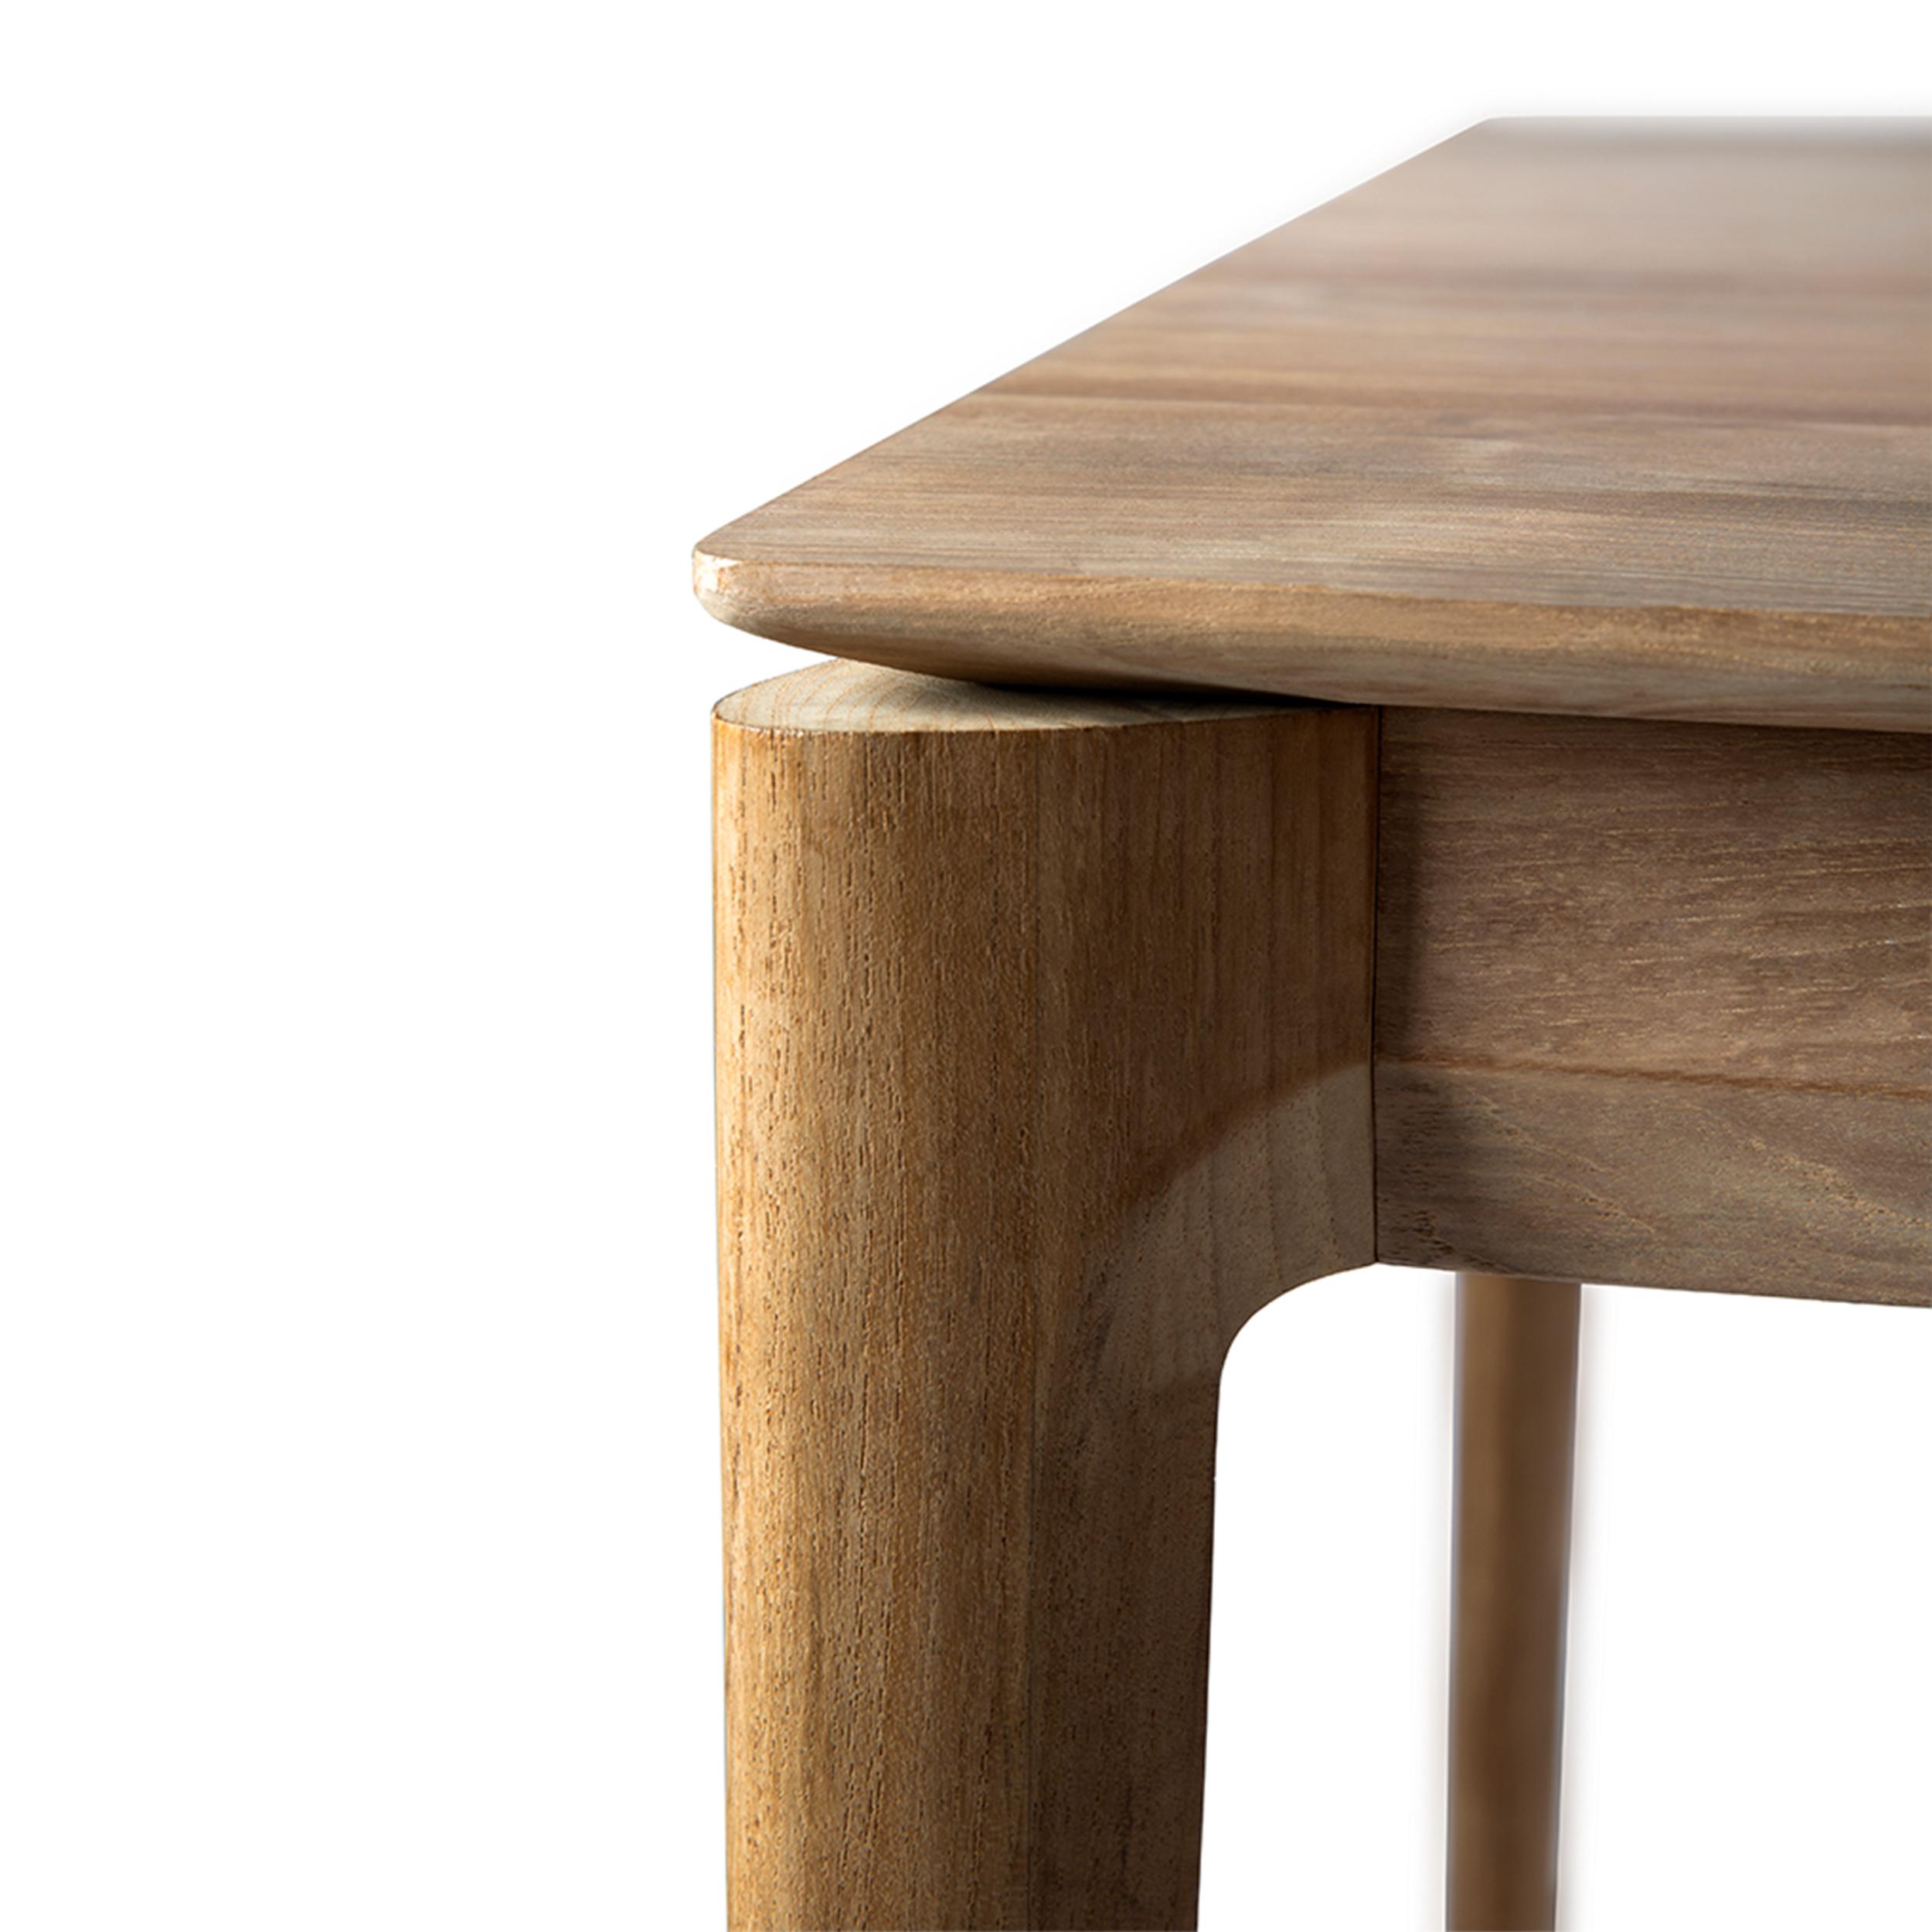 10162 Teak Bok dining table detail (1).jpg.png